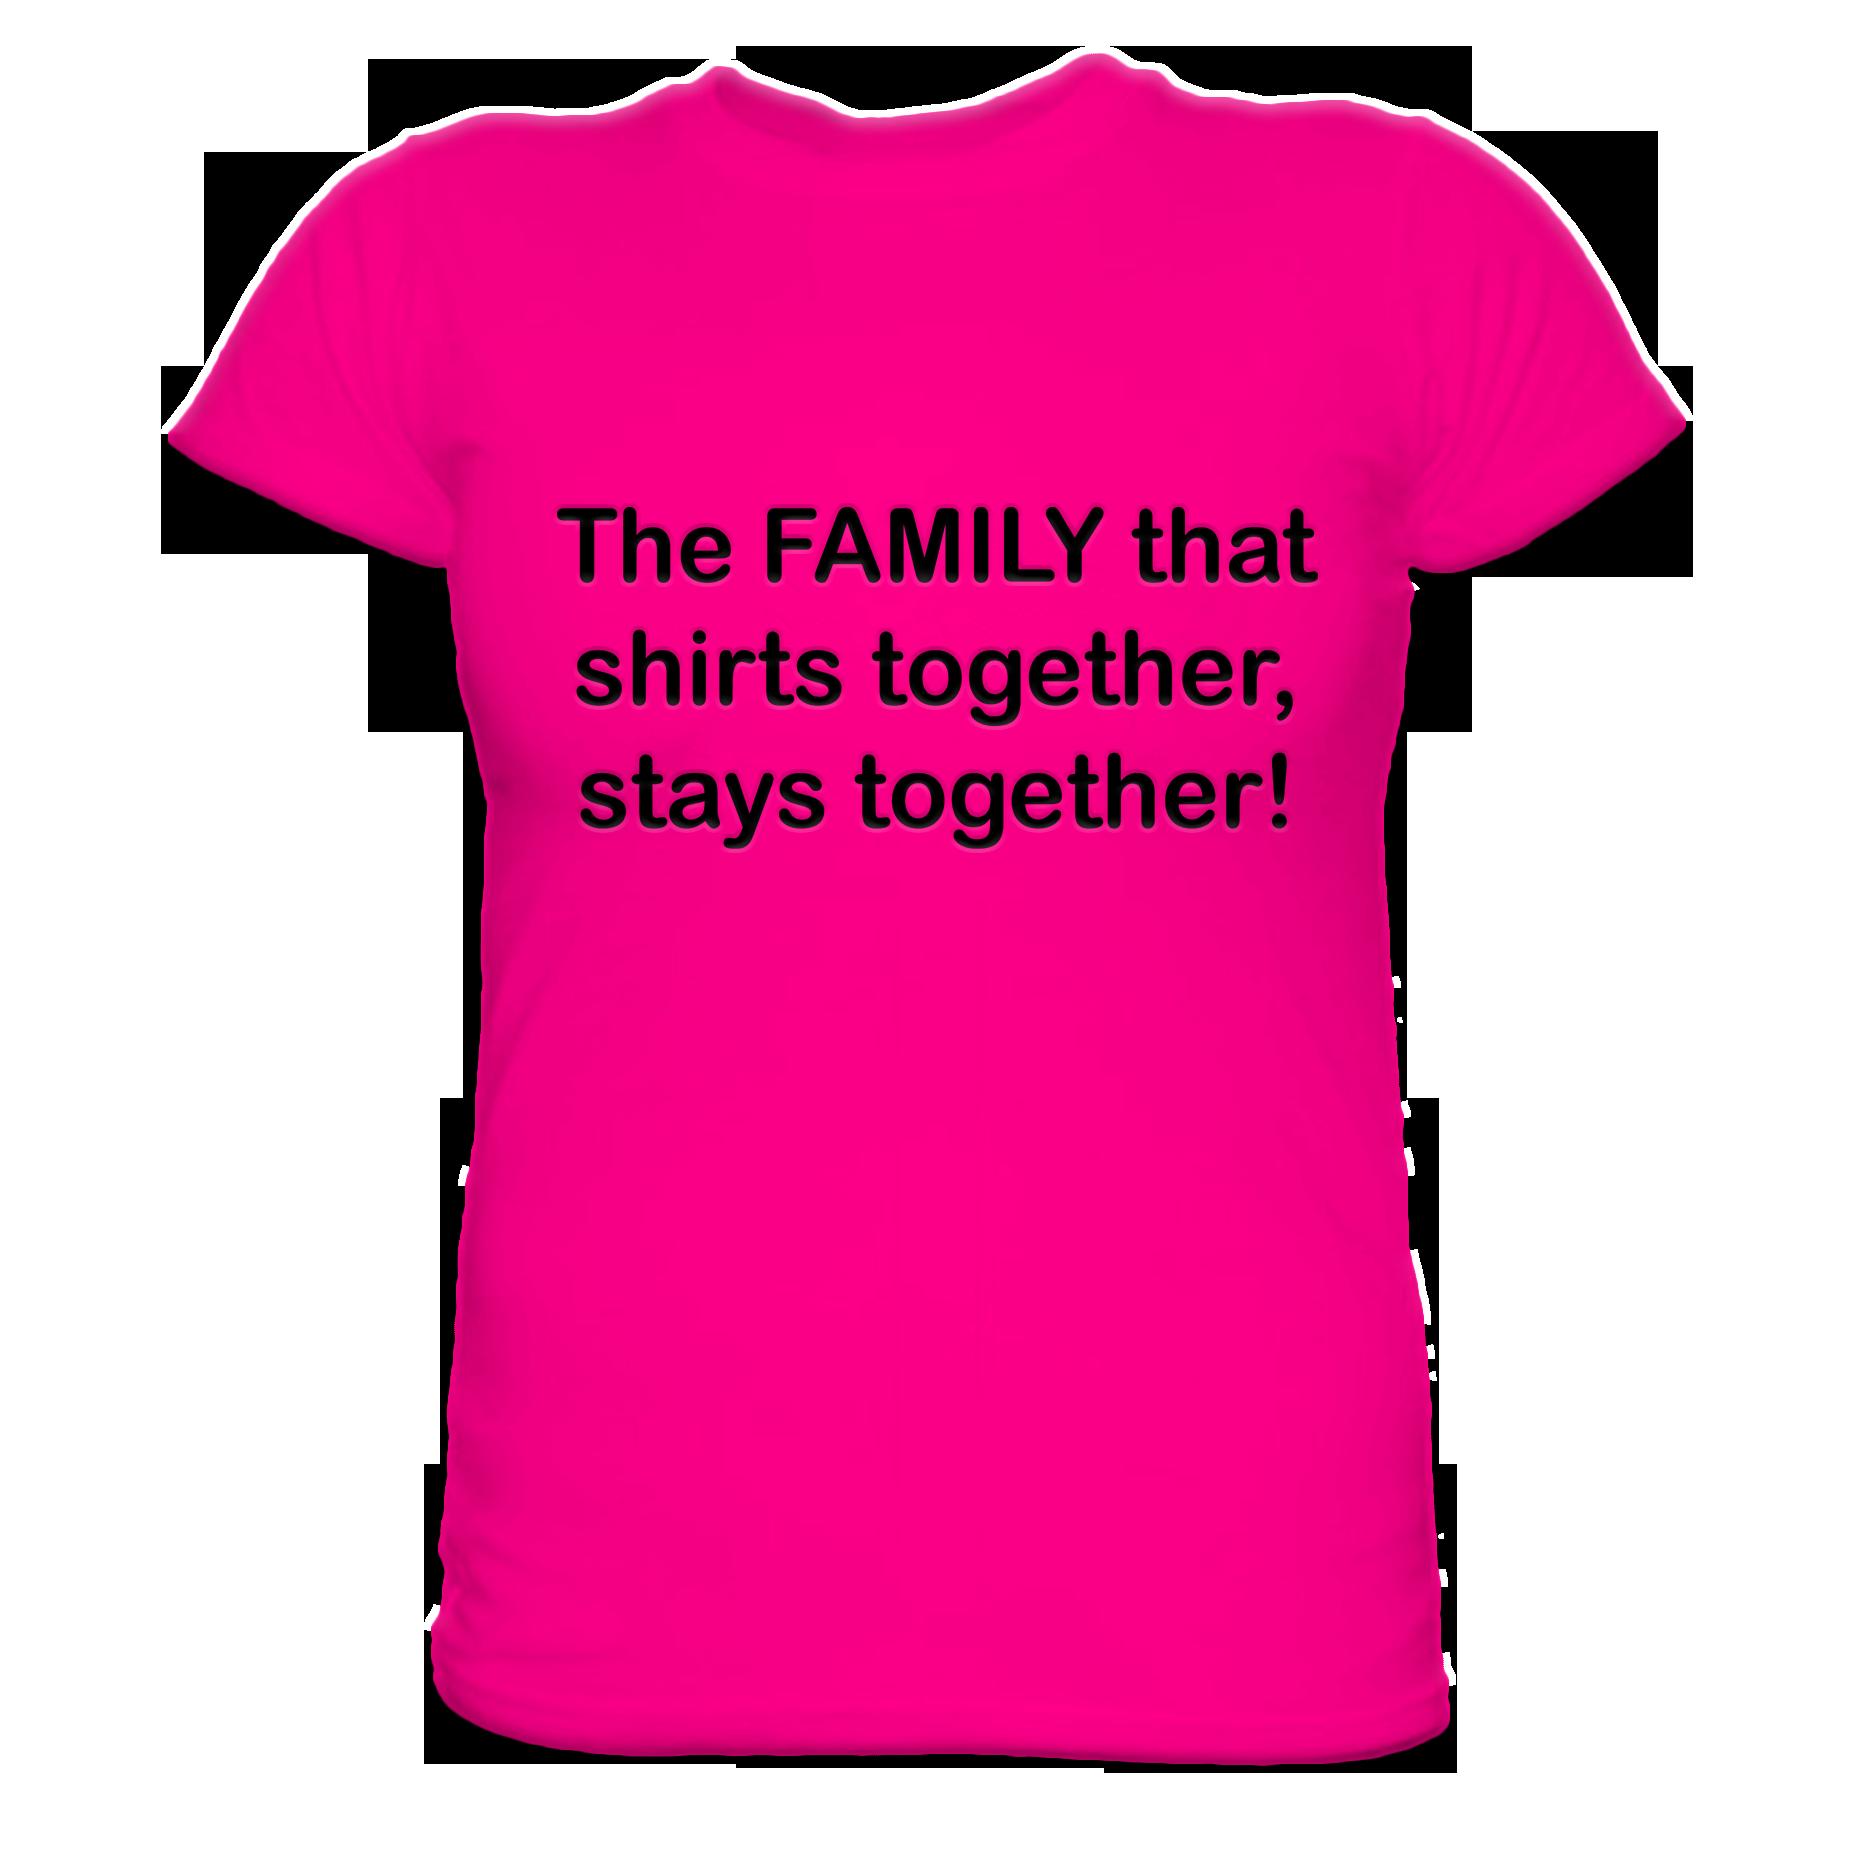 clipart royalty free Washing clipart shirt. Family reunion t shirts